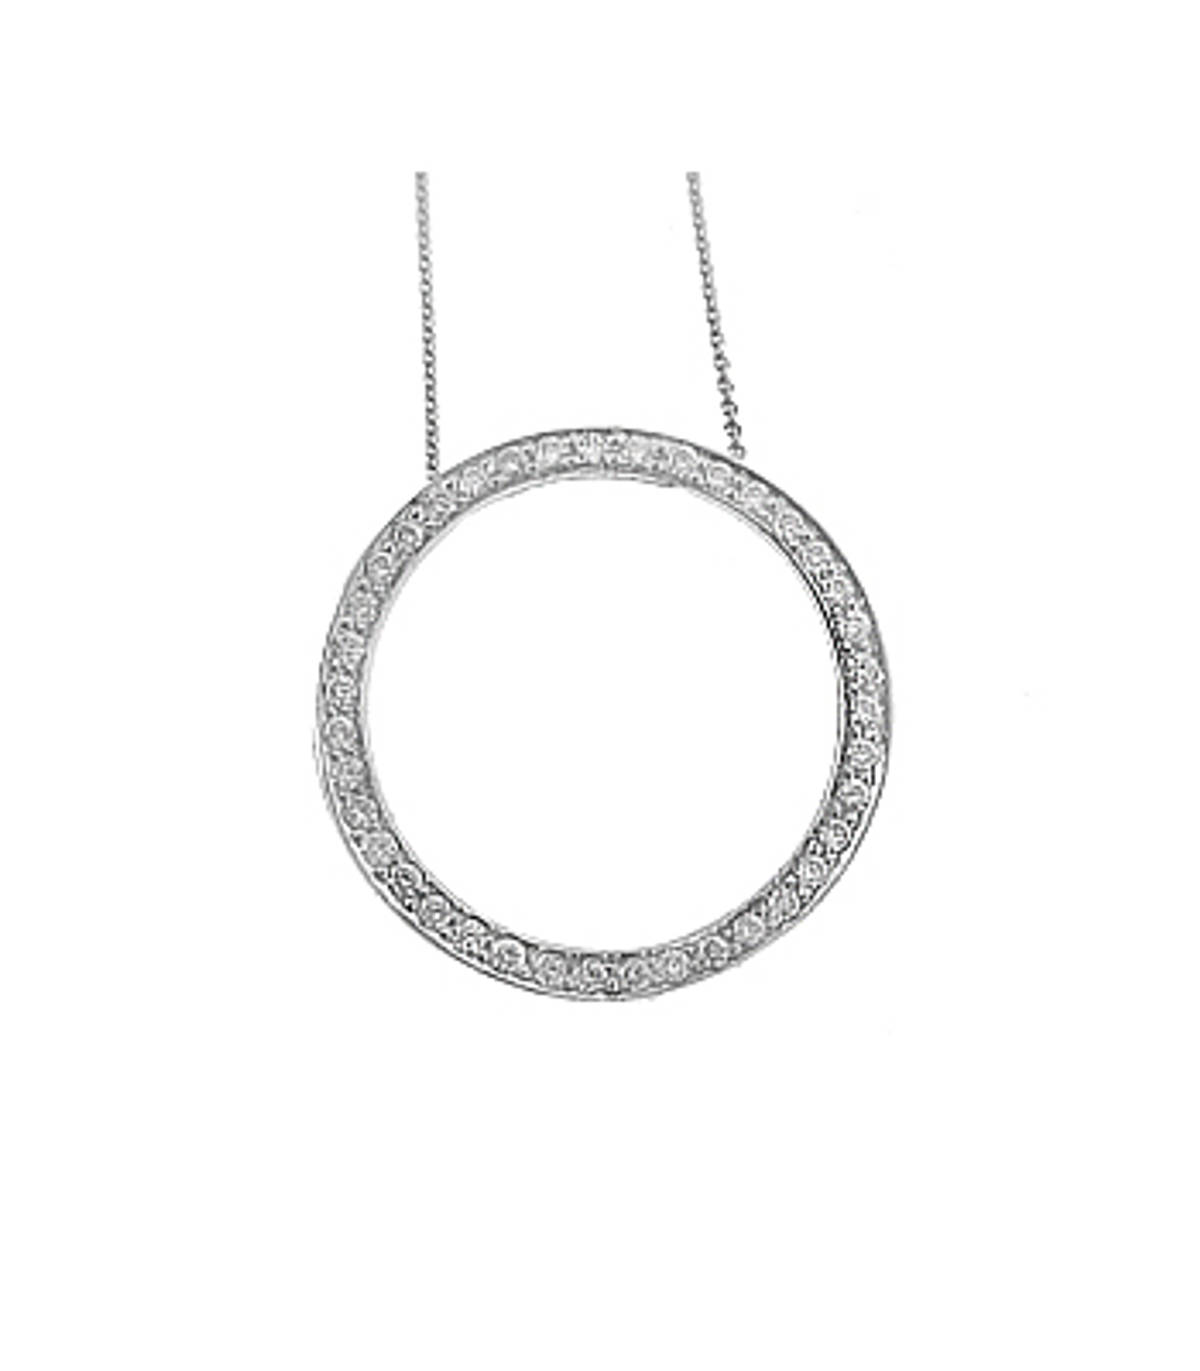 "18k White Gold Brilliant Cut Diamond Circle Pendant On 18k White Gold 18"" Chain Total Diamond Weight 0.31cts  Pendant length 2.1cmPendant width 2.1cm"